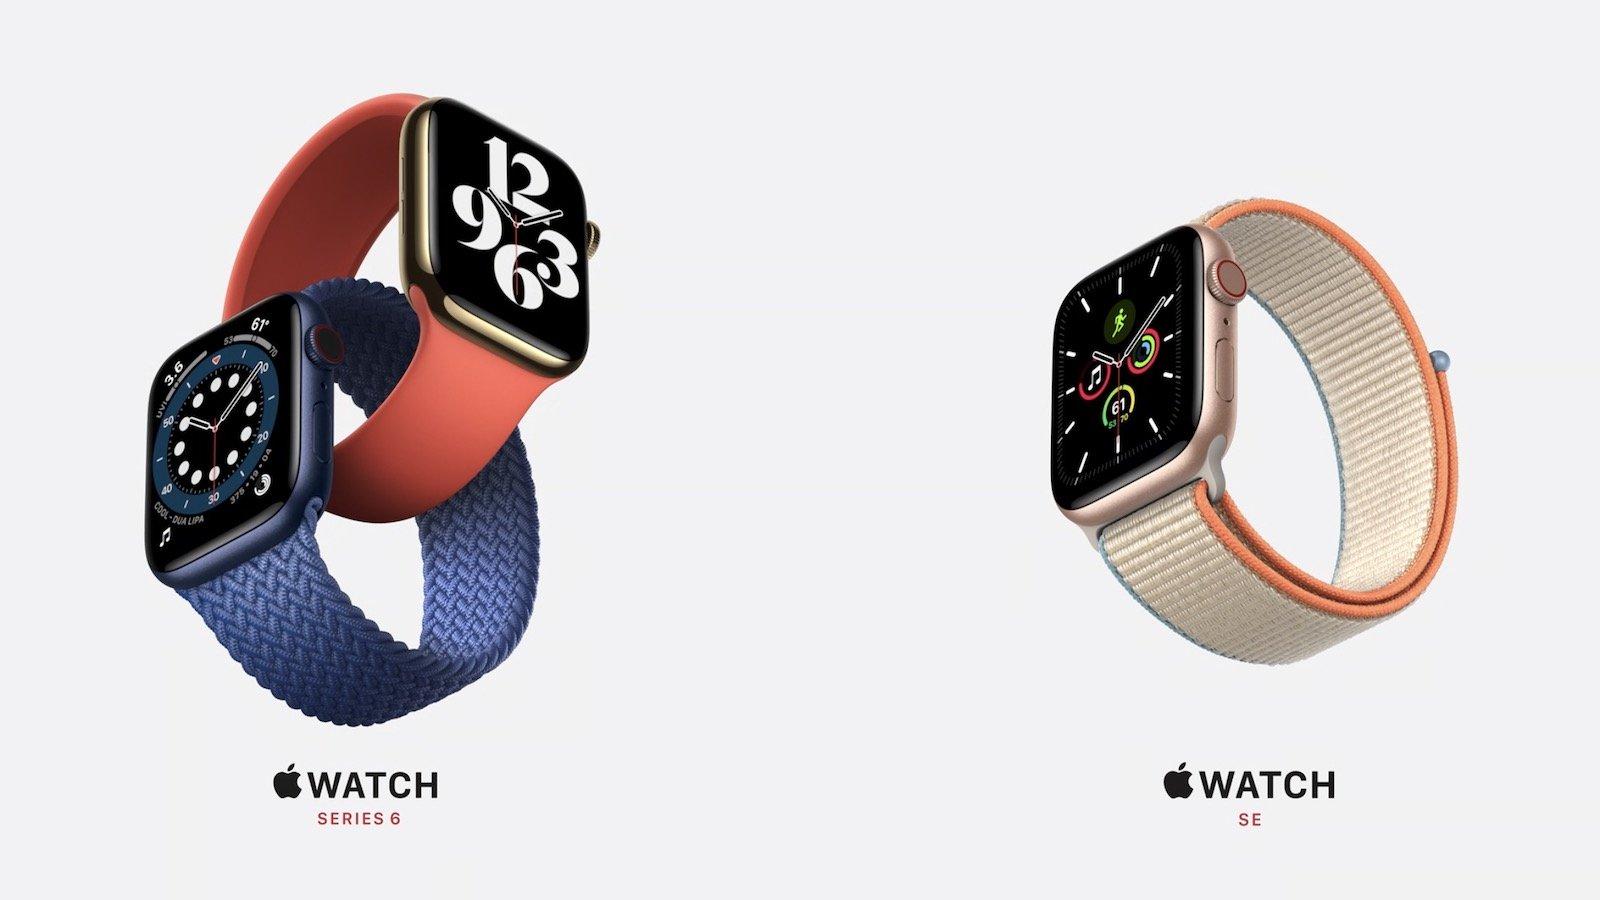 Apple Watch Series 6/SEが発売。革新的なウェルネスと低価格モデル